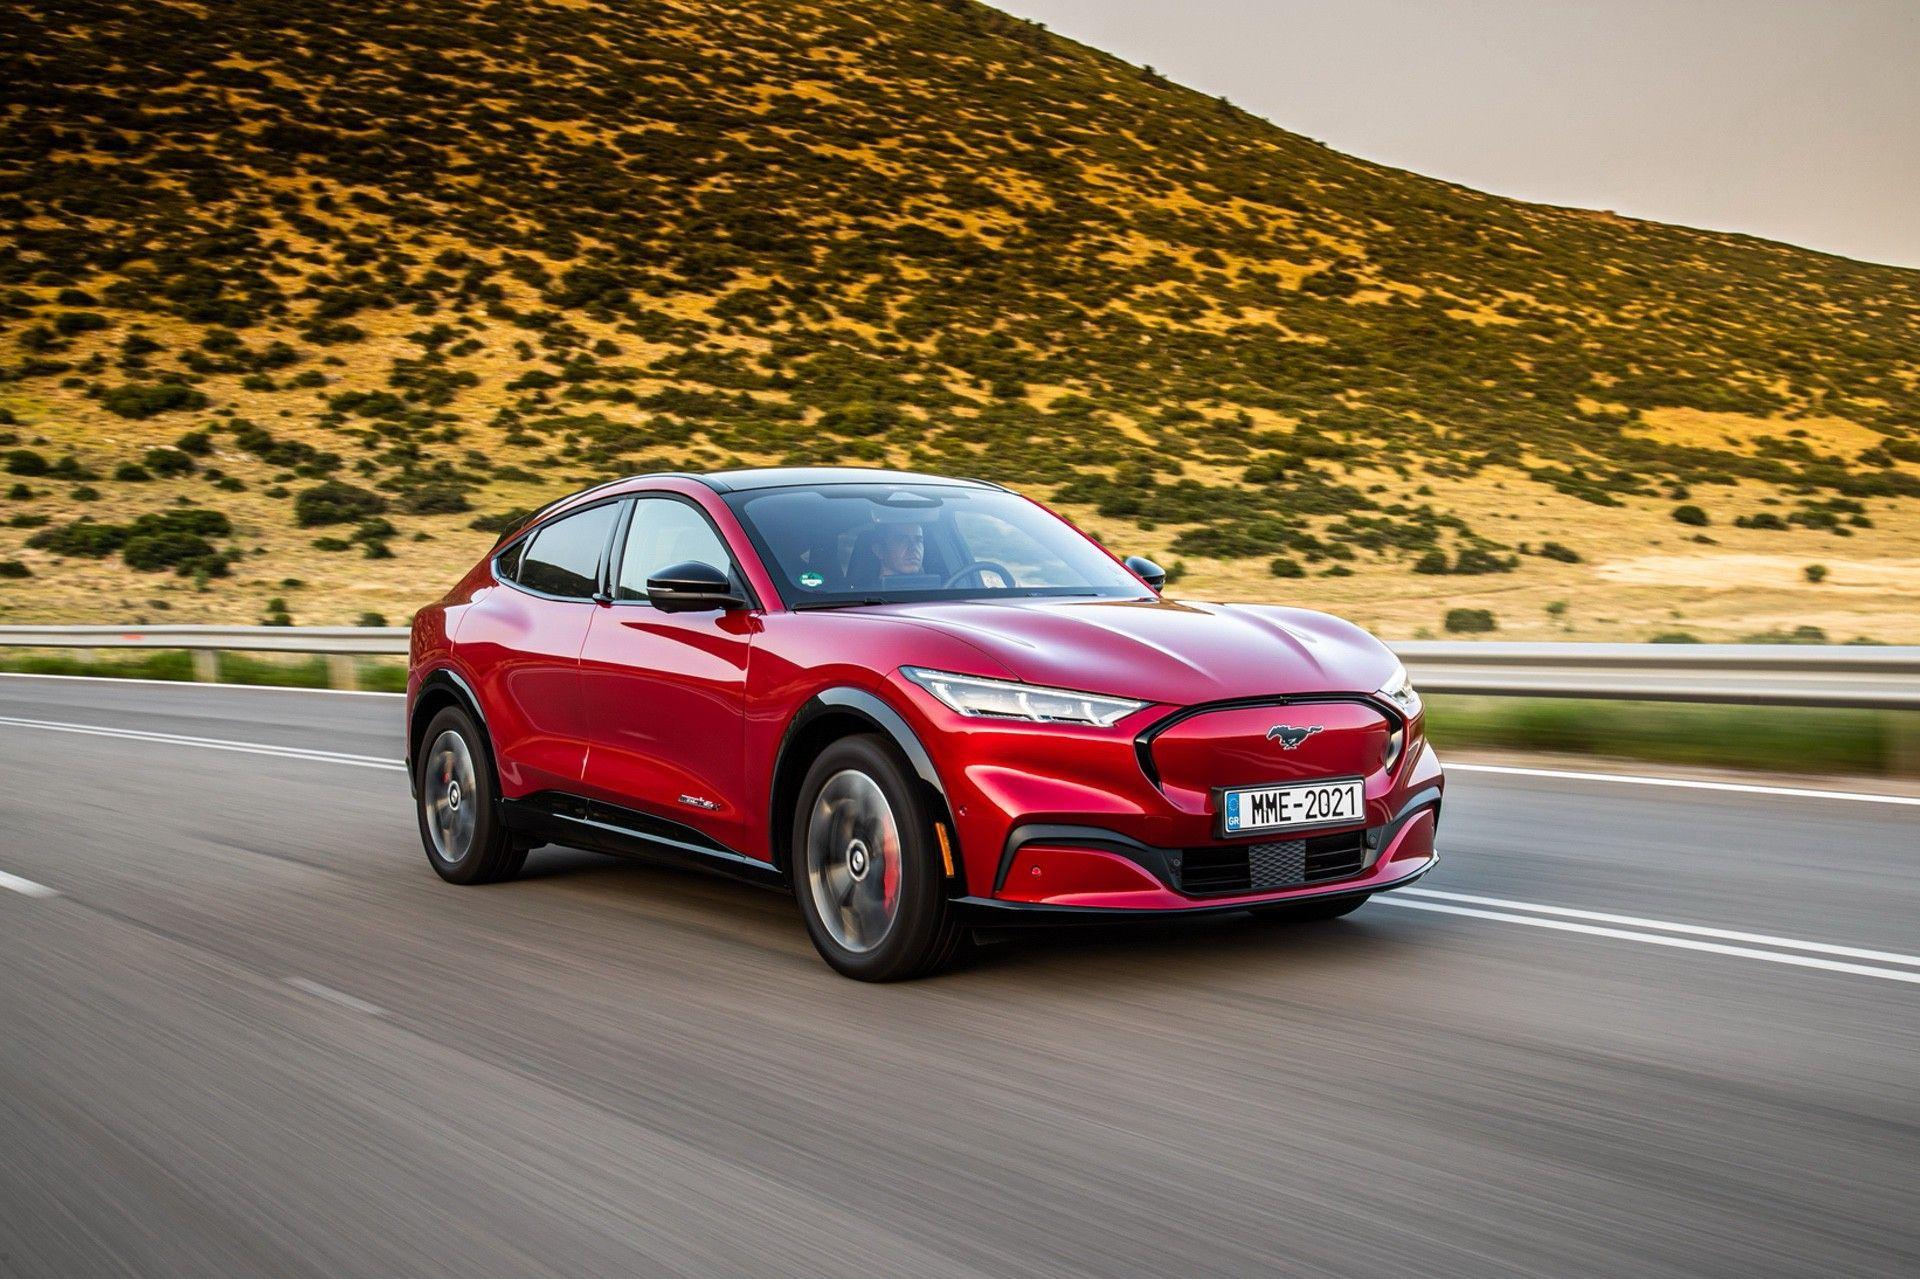 Ford_Mustang_Mach-E_greek_presskit-0113